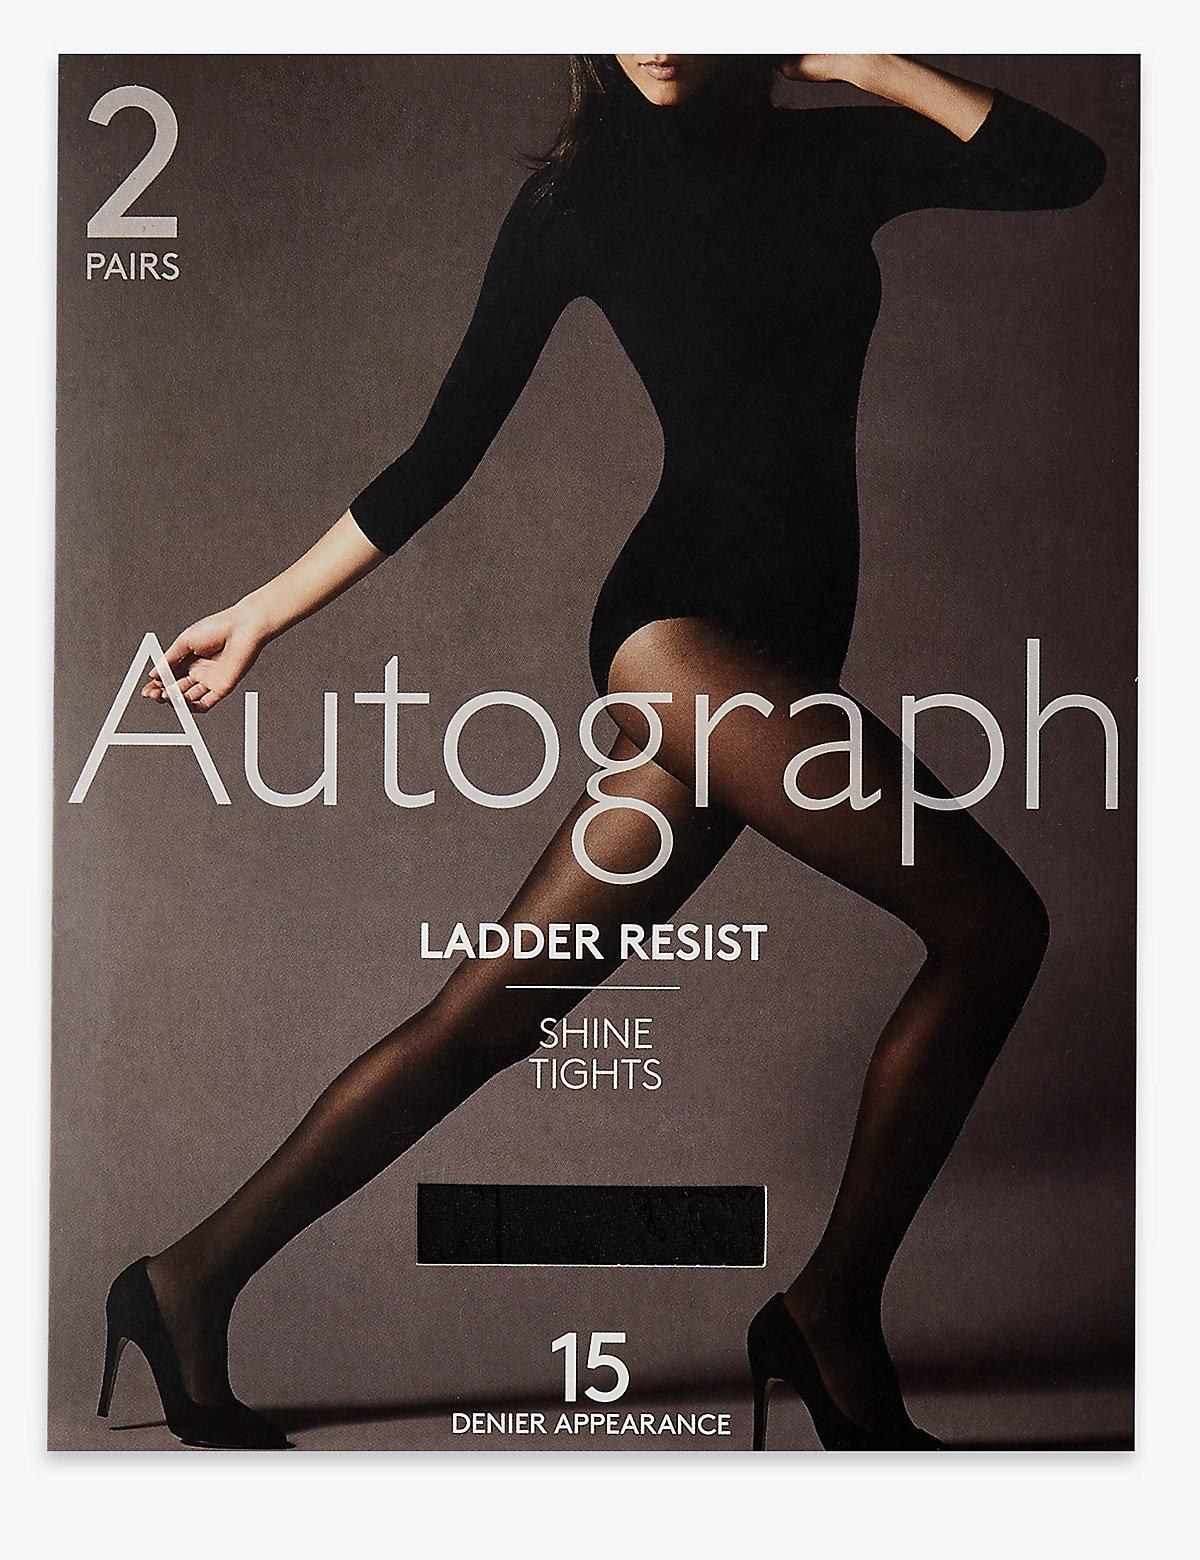 Autograph 2 Pack 15 Denier Ladder Resist Shine Tights